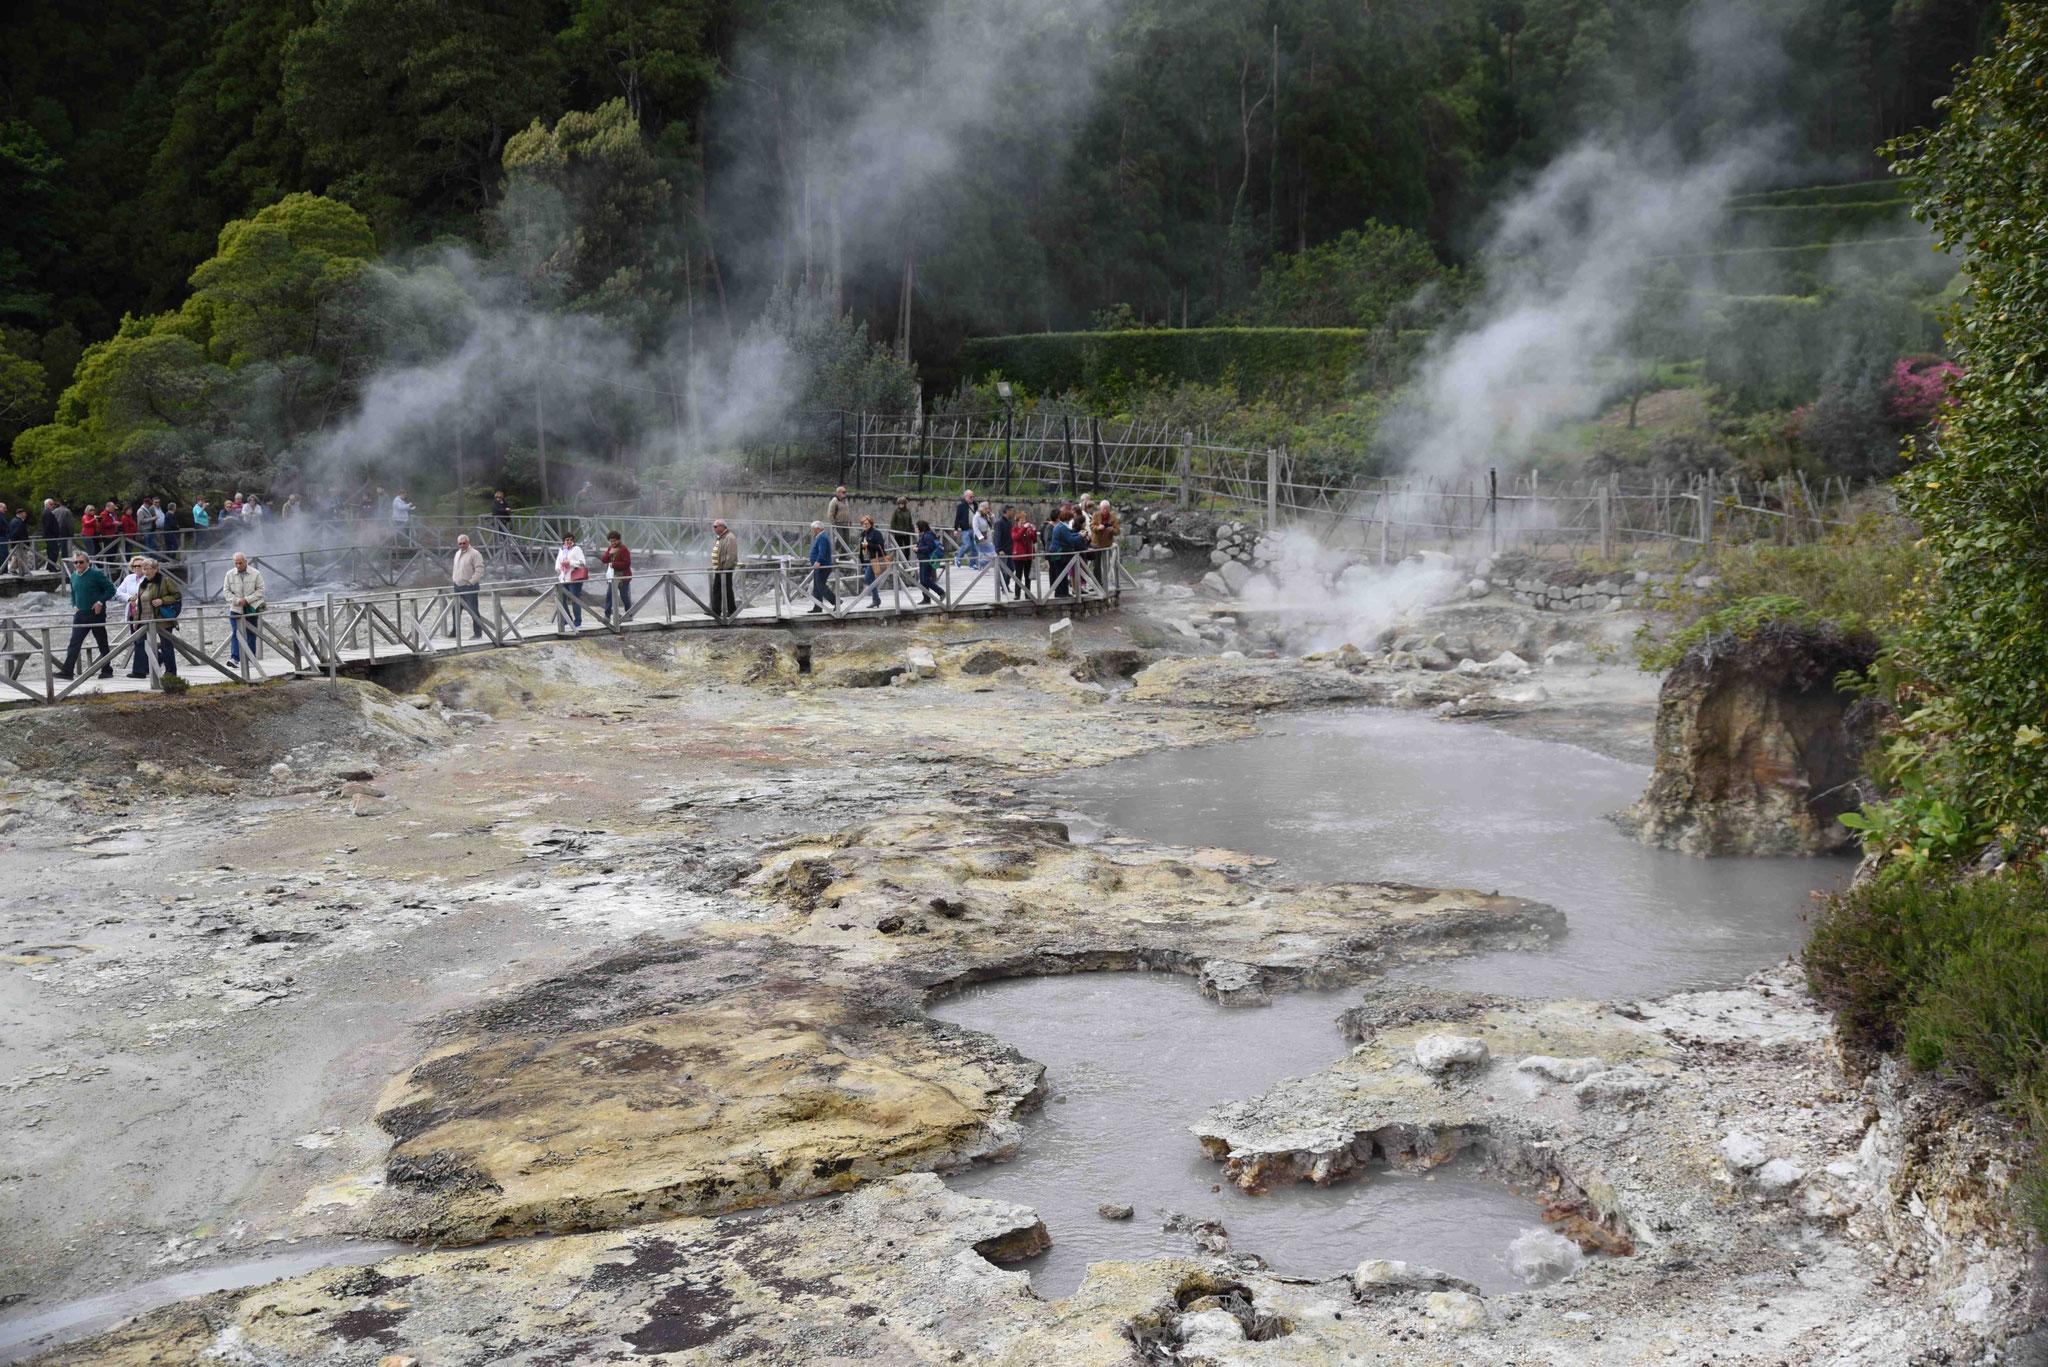 Caldeiras da Lagoa das Furnas - vorsicht Verbrennungsgefahr